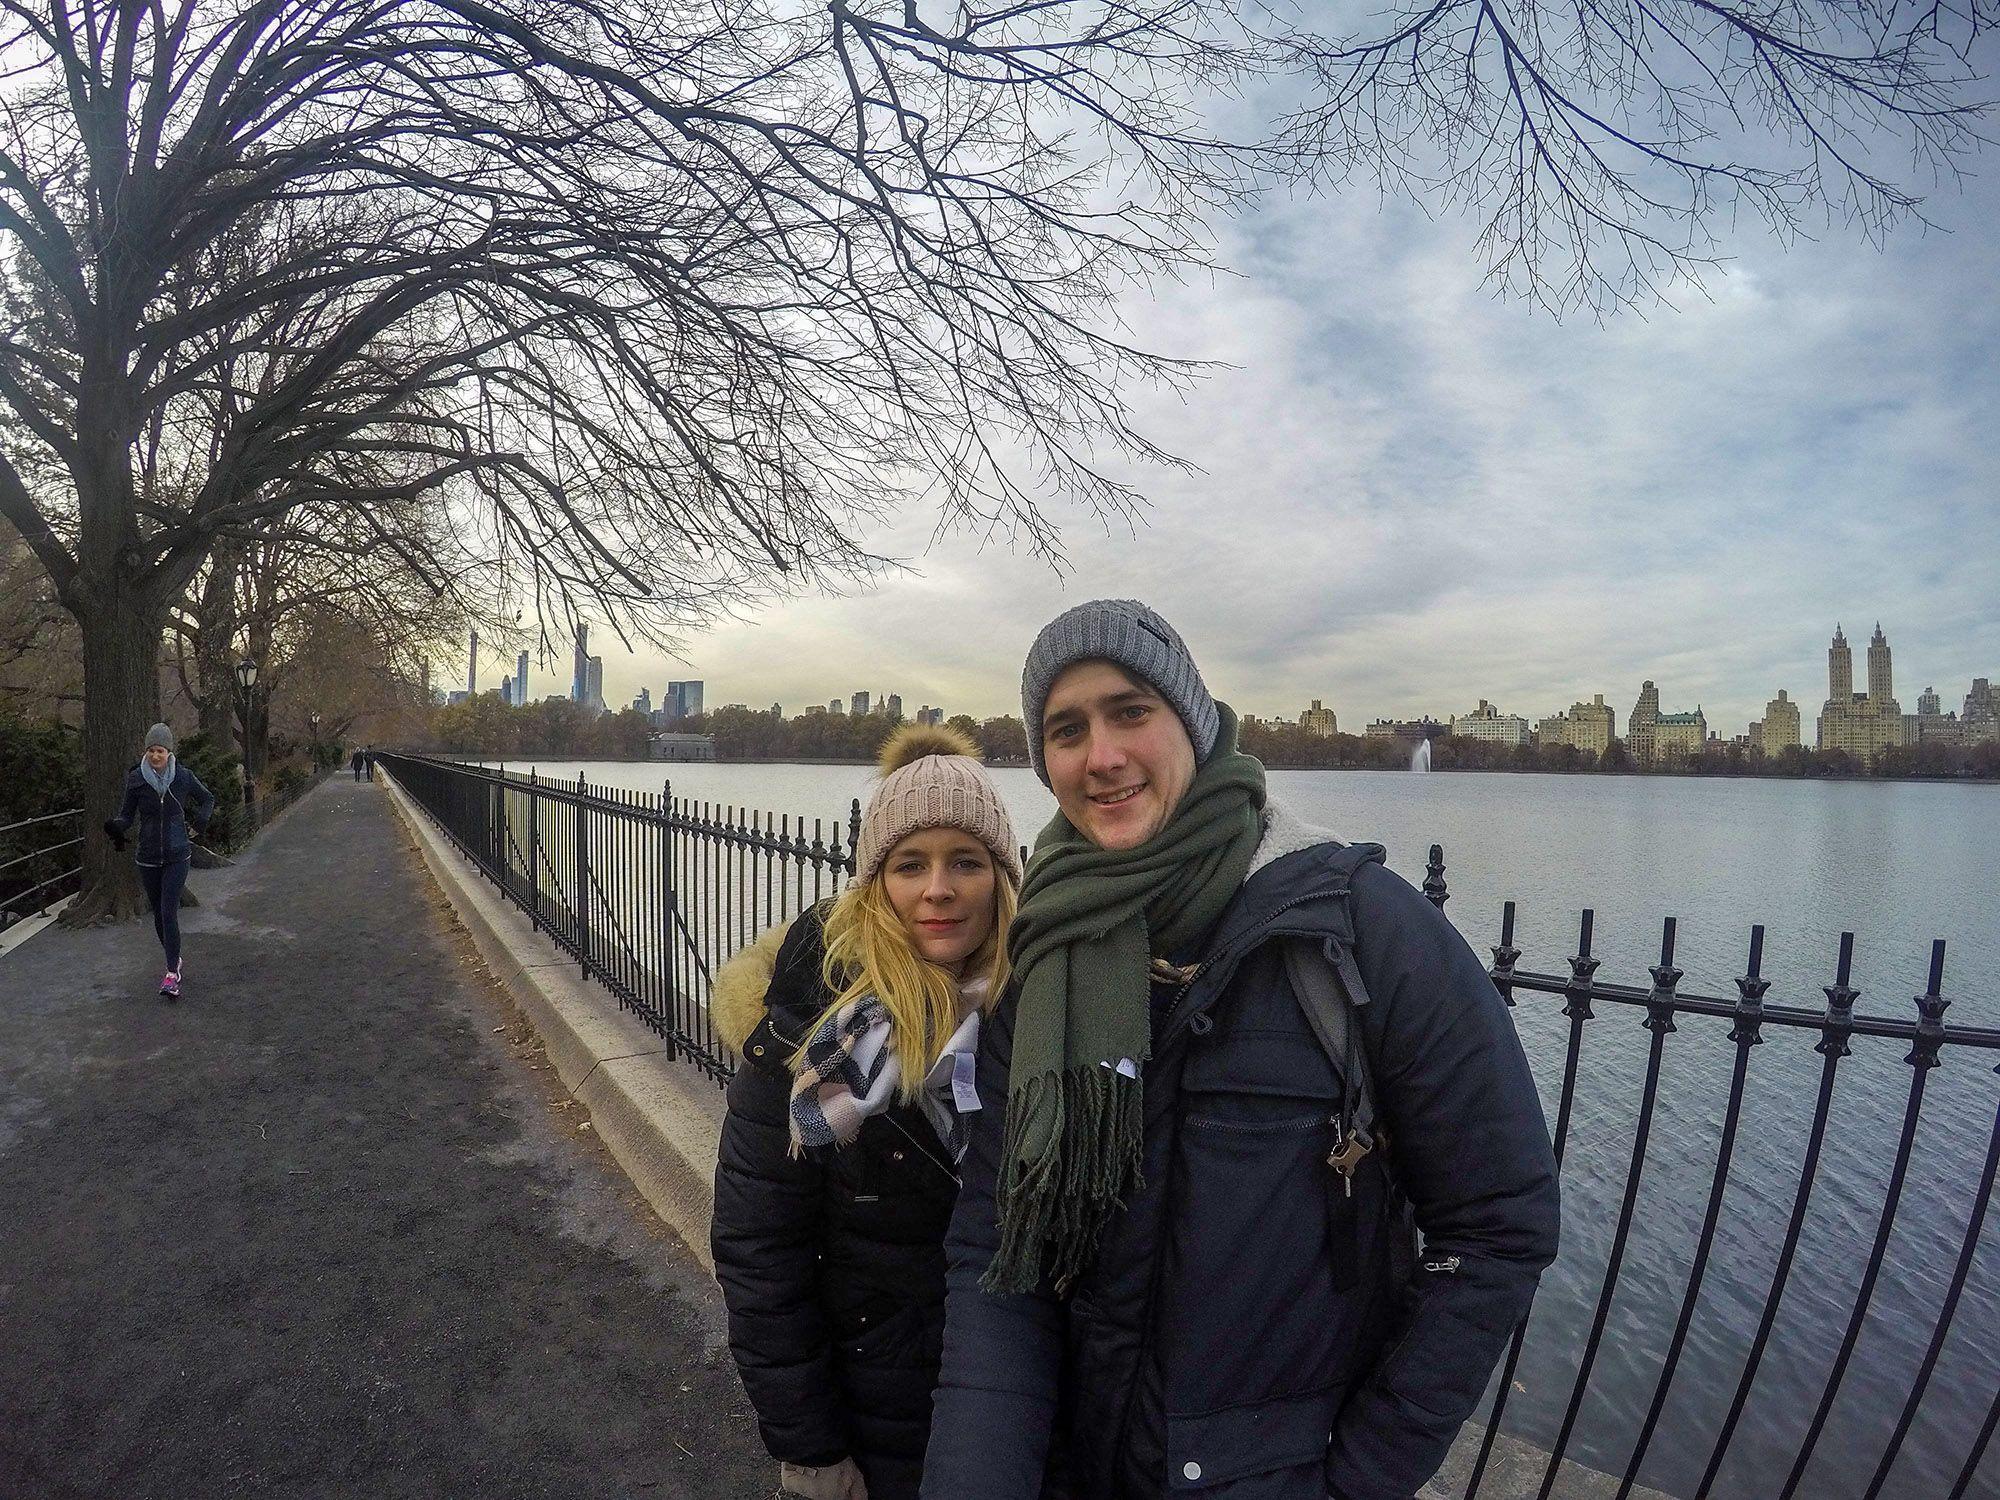 Reserva de Agua de Jacqueline Kennedy Onassis, Central Park